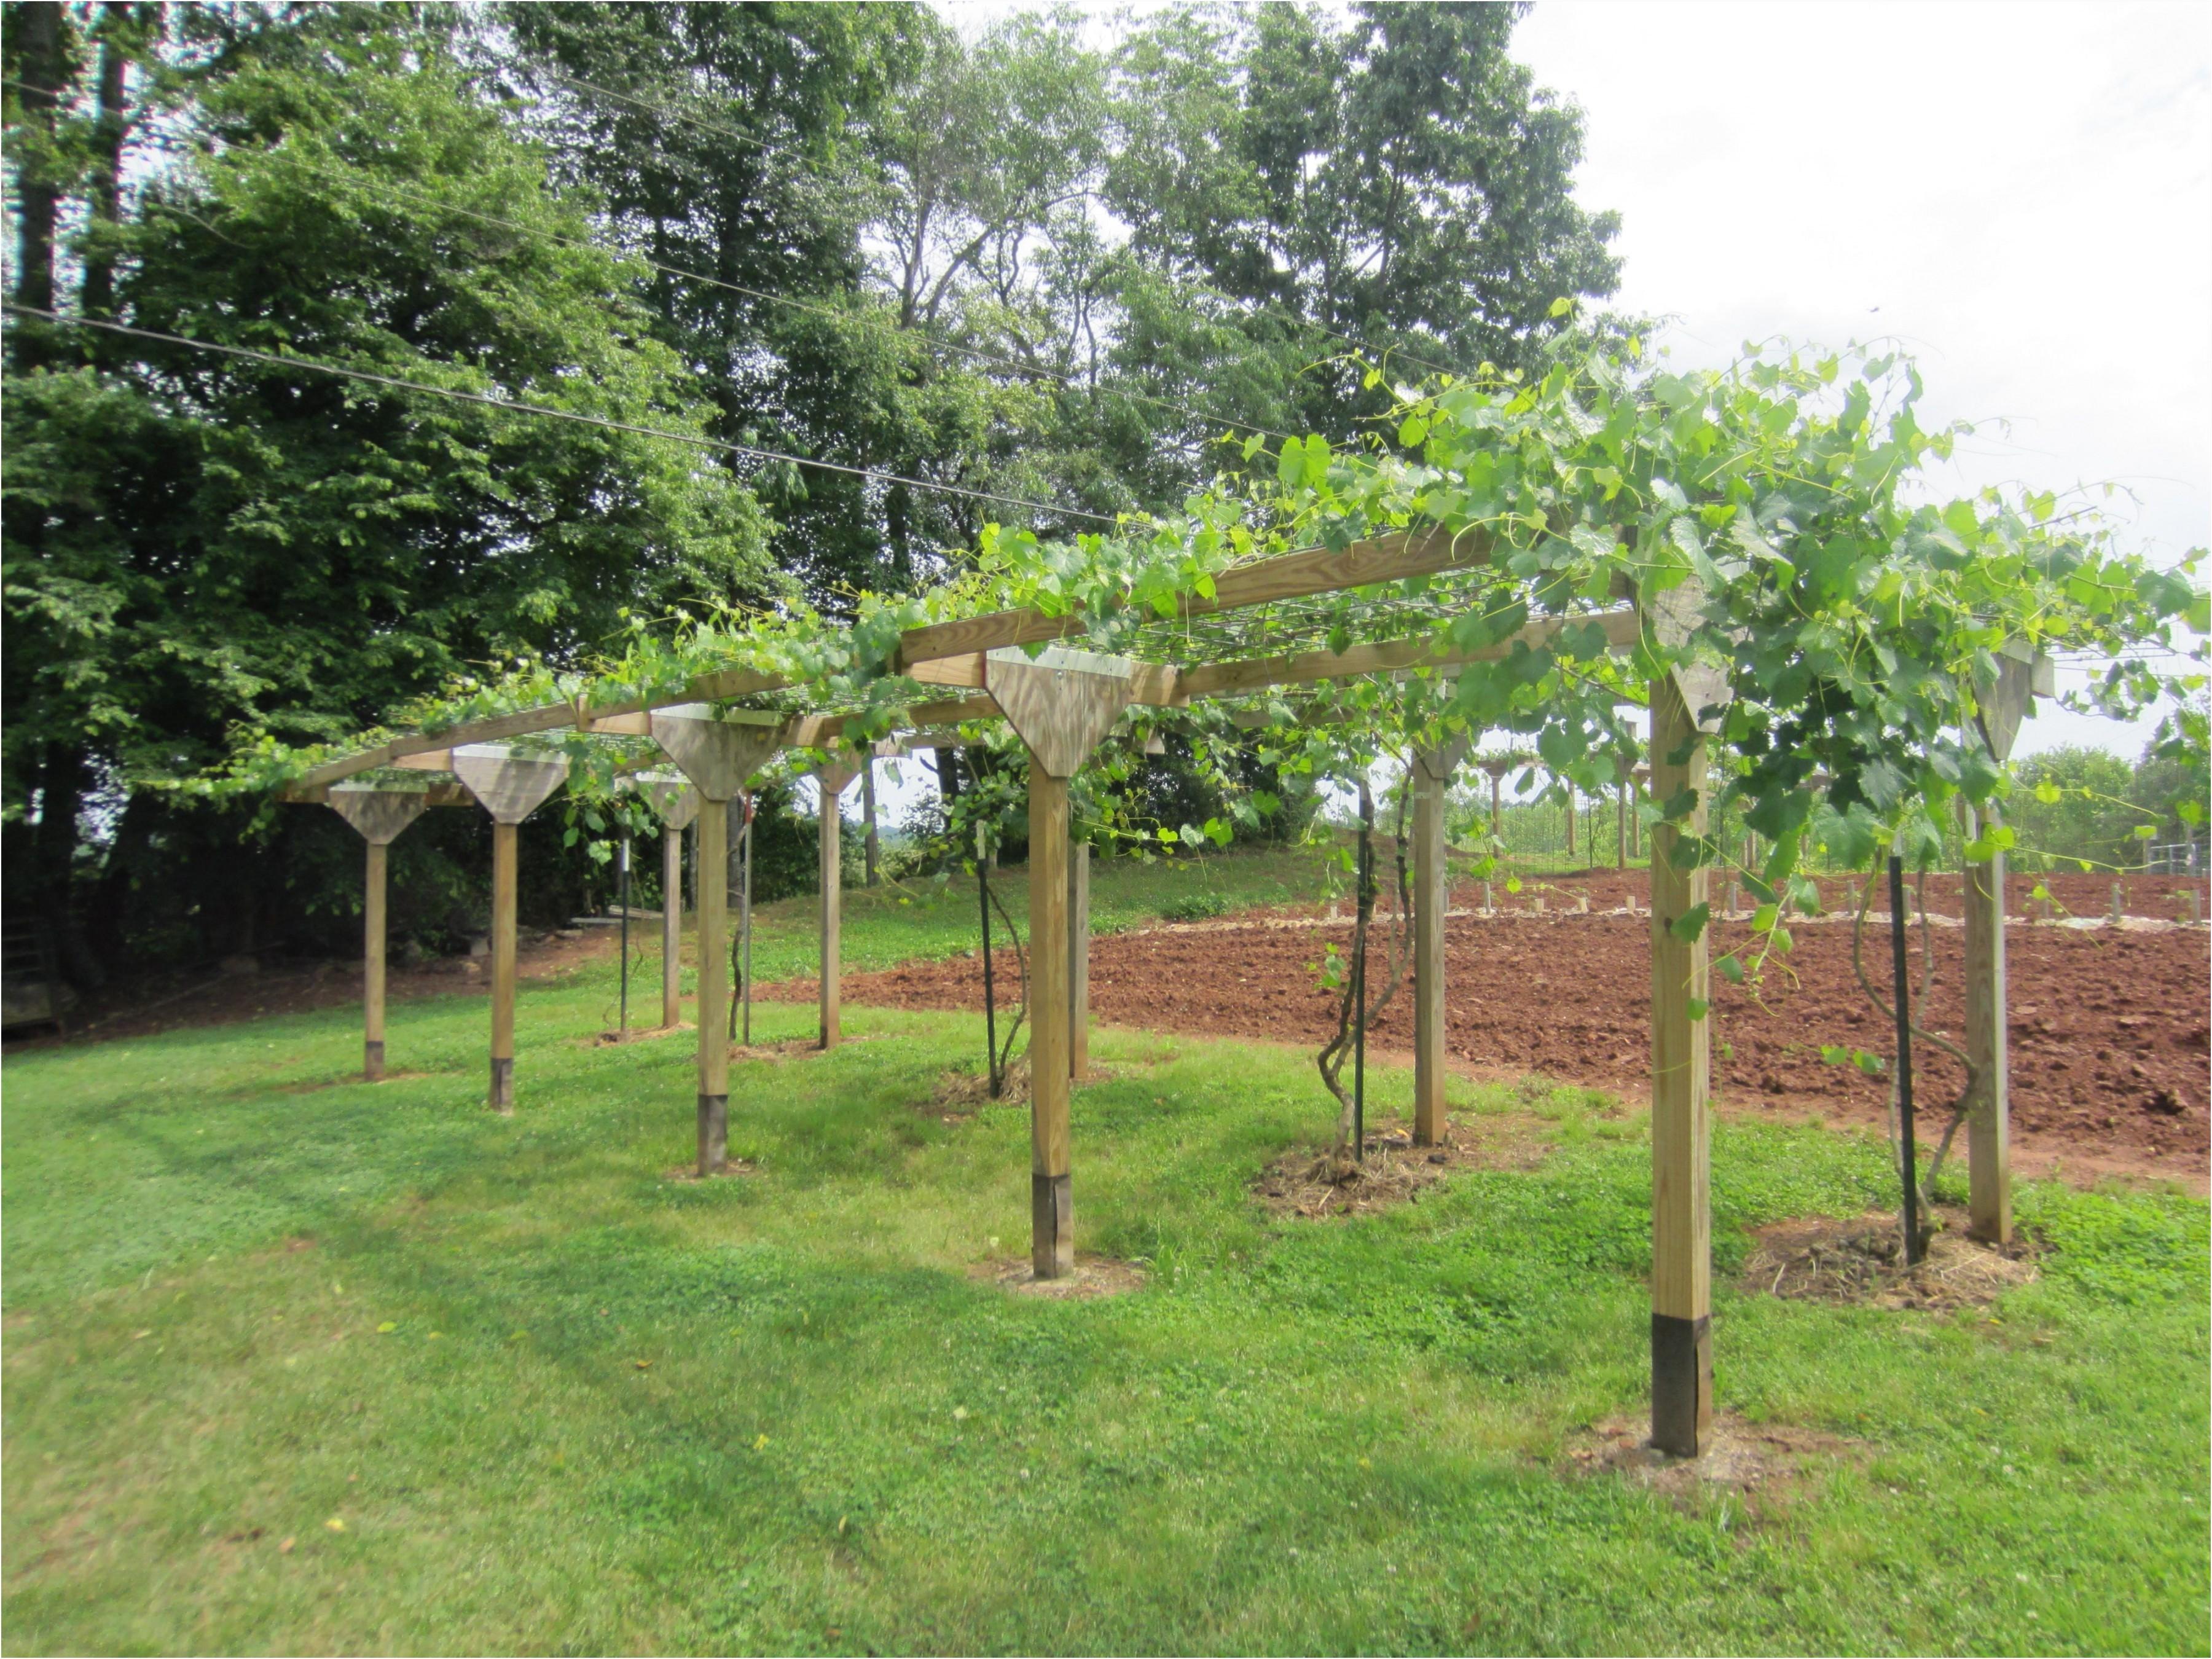 muscadine type grape arbor plete with spigots at each vine each